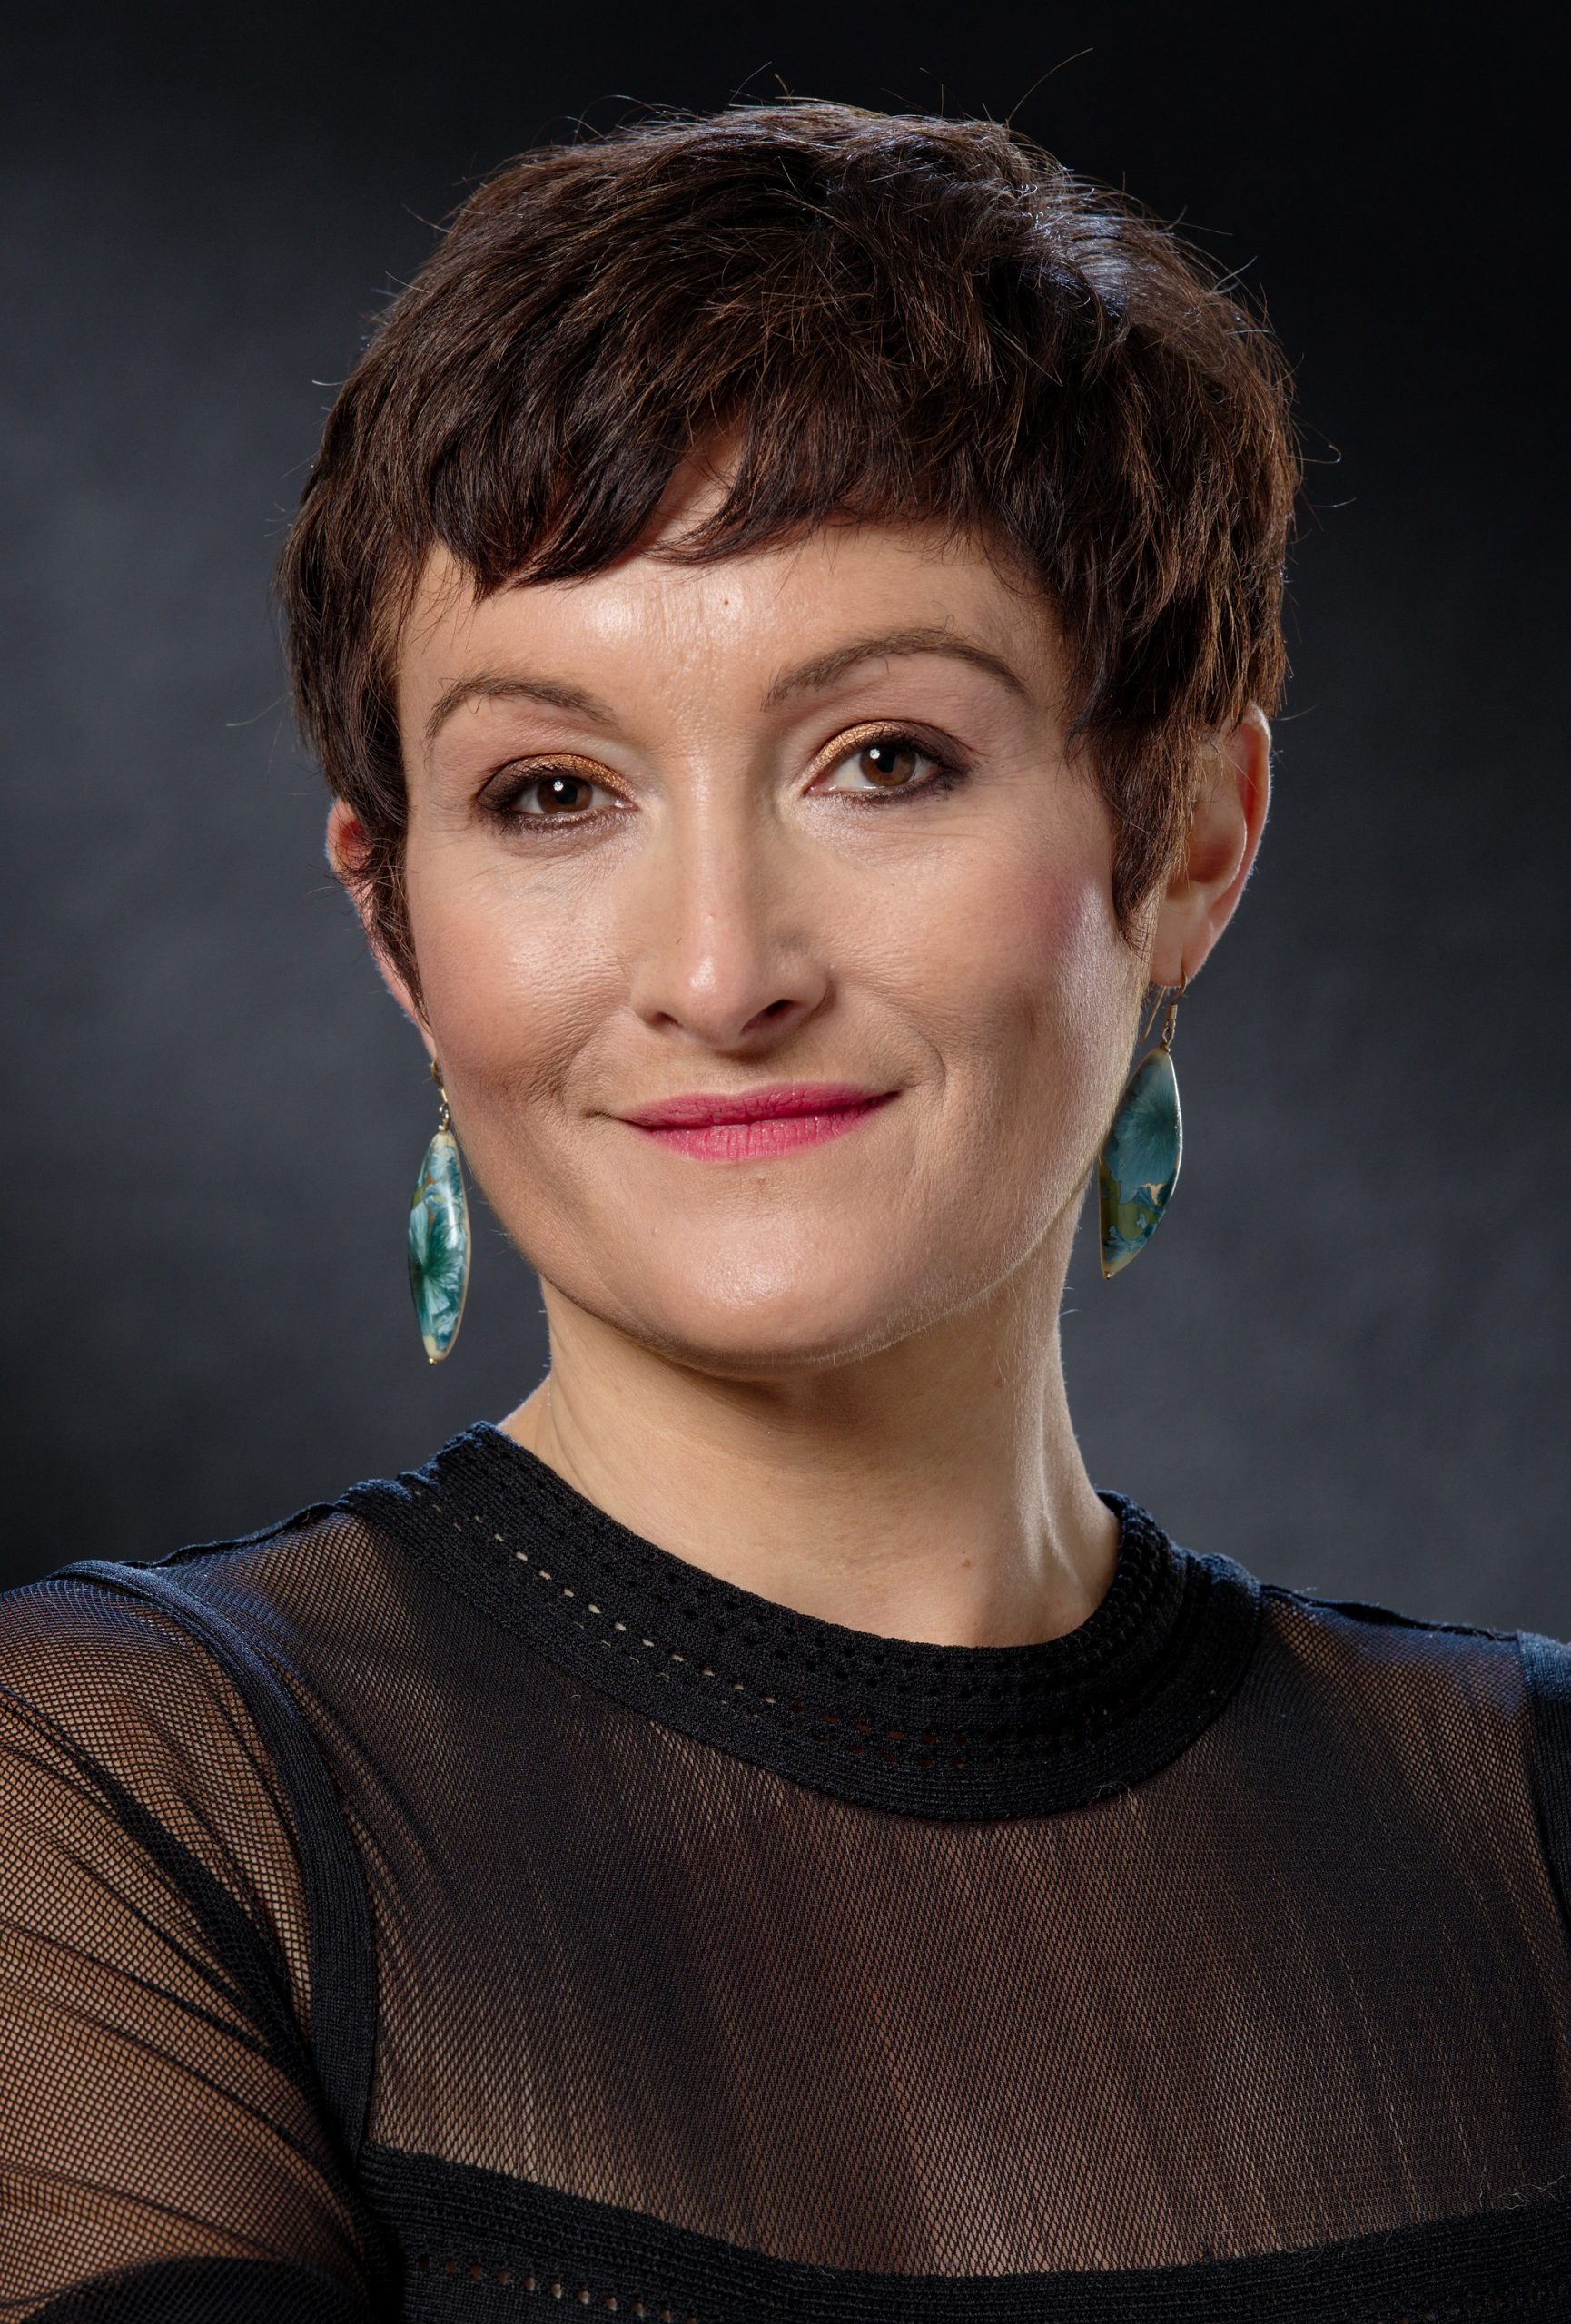 Nathalie Chusseau